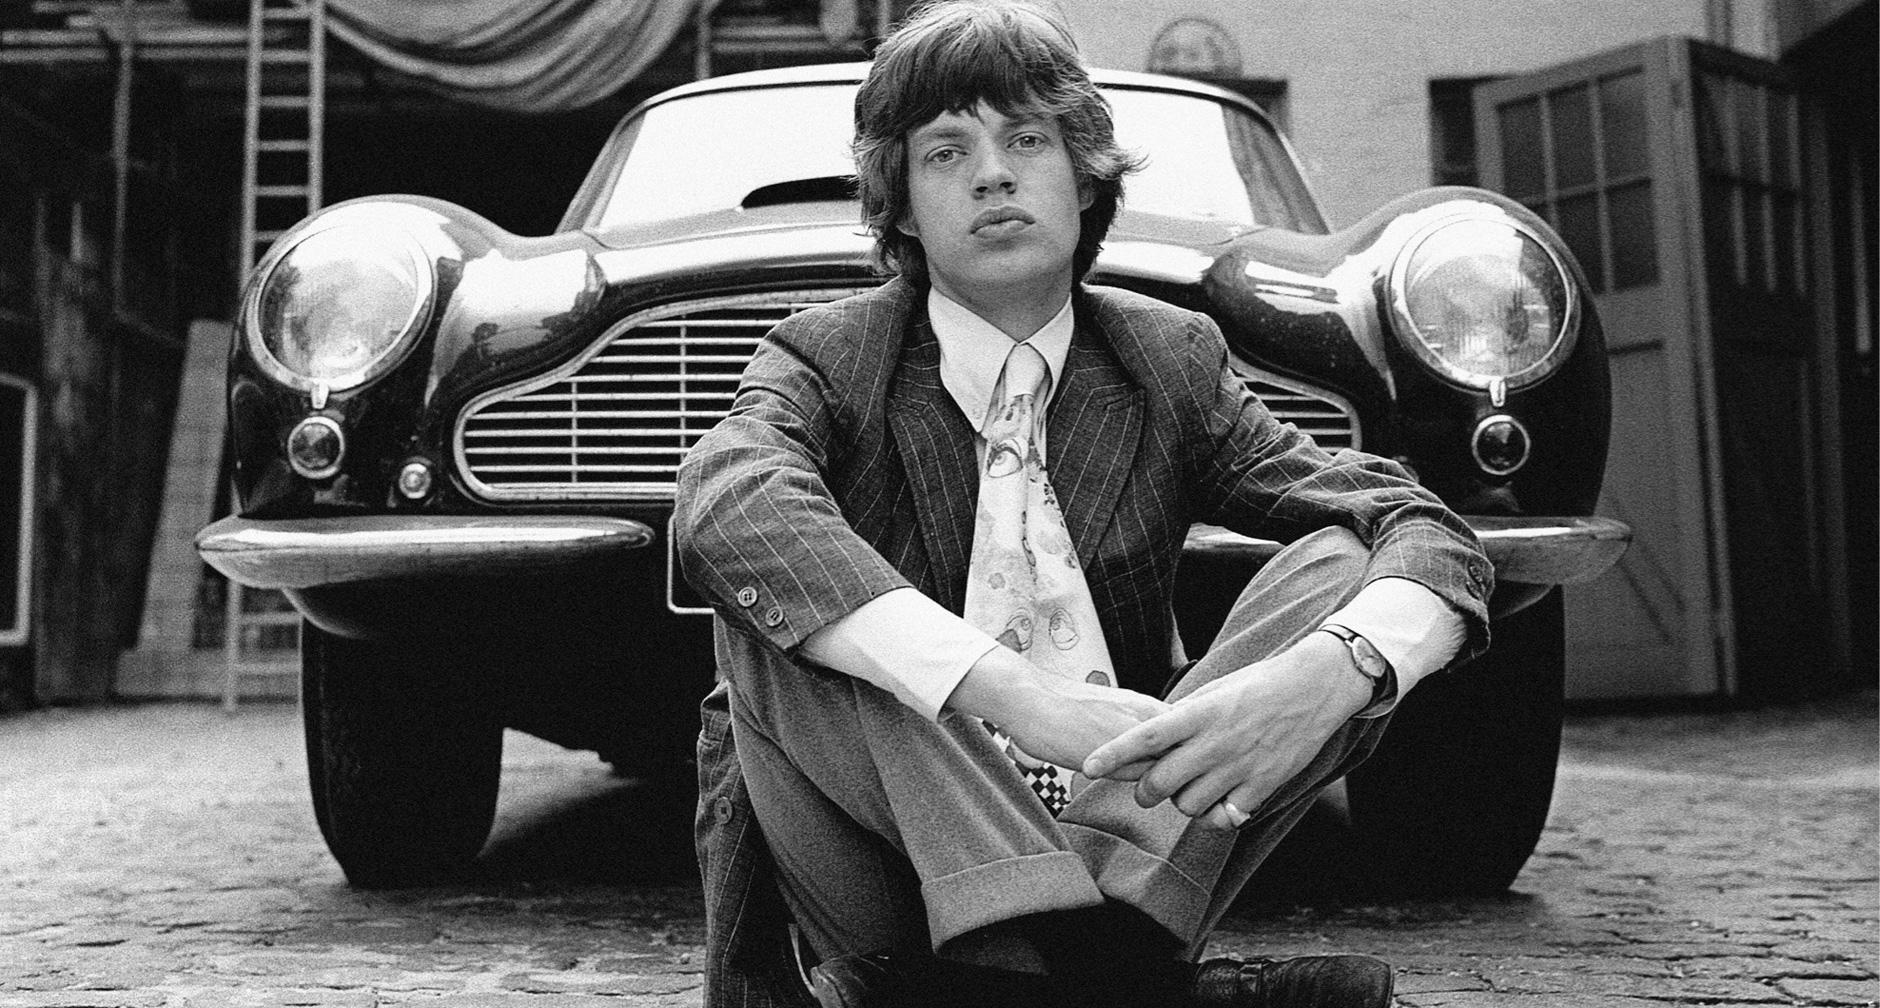 50s Classic Cars Wallpaper Antiquorum Auction Rock Stars On Camera Classic Driver